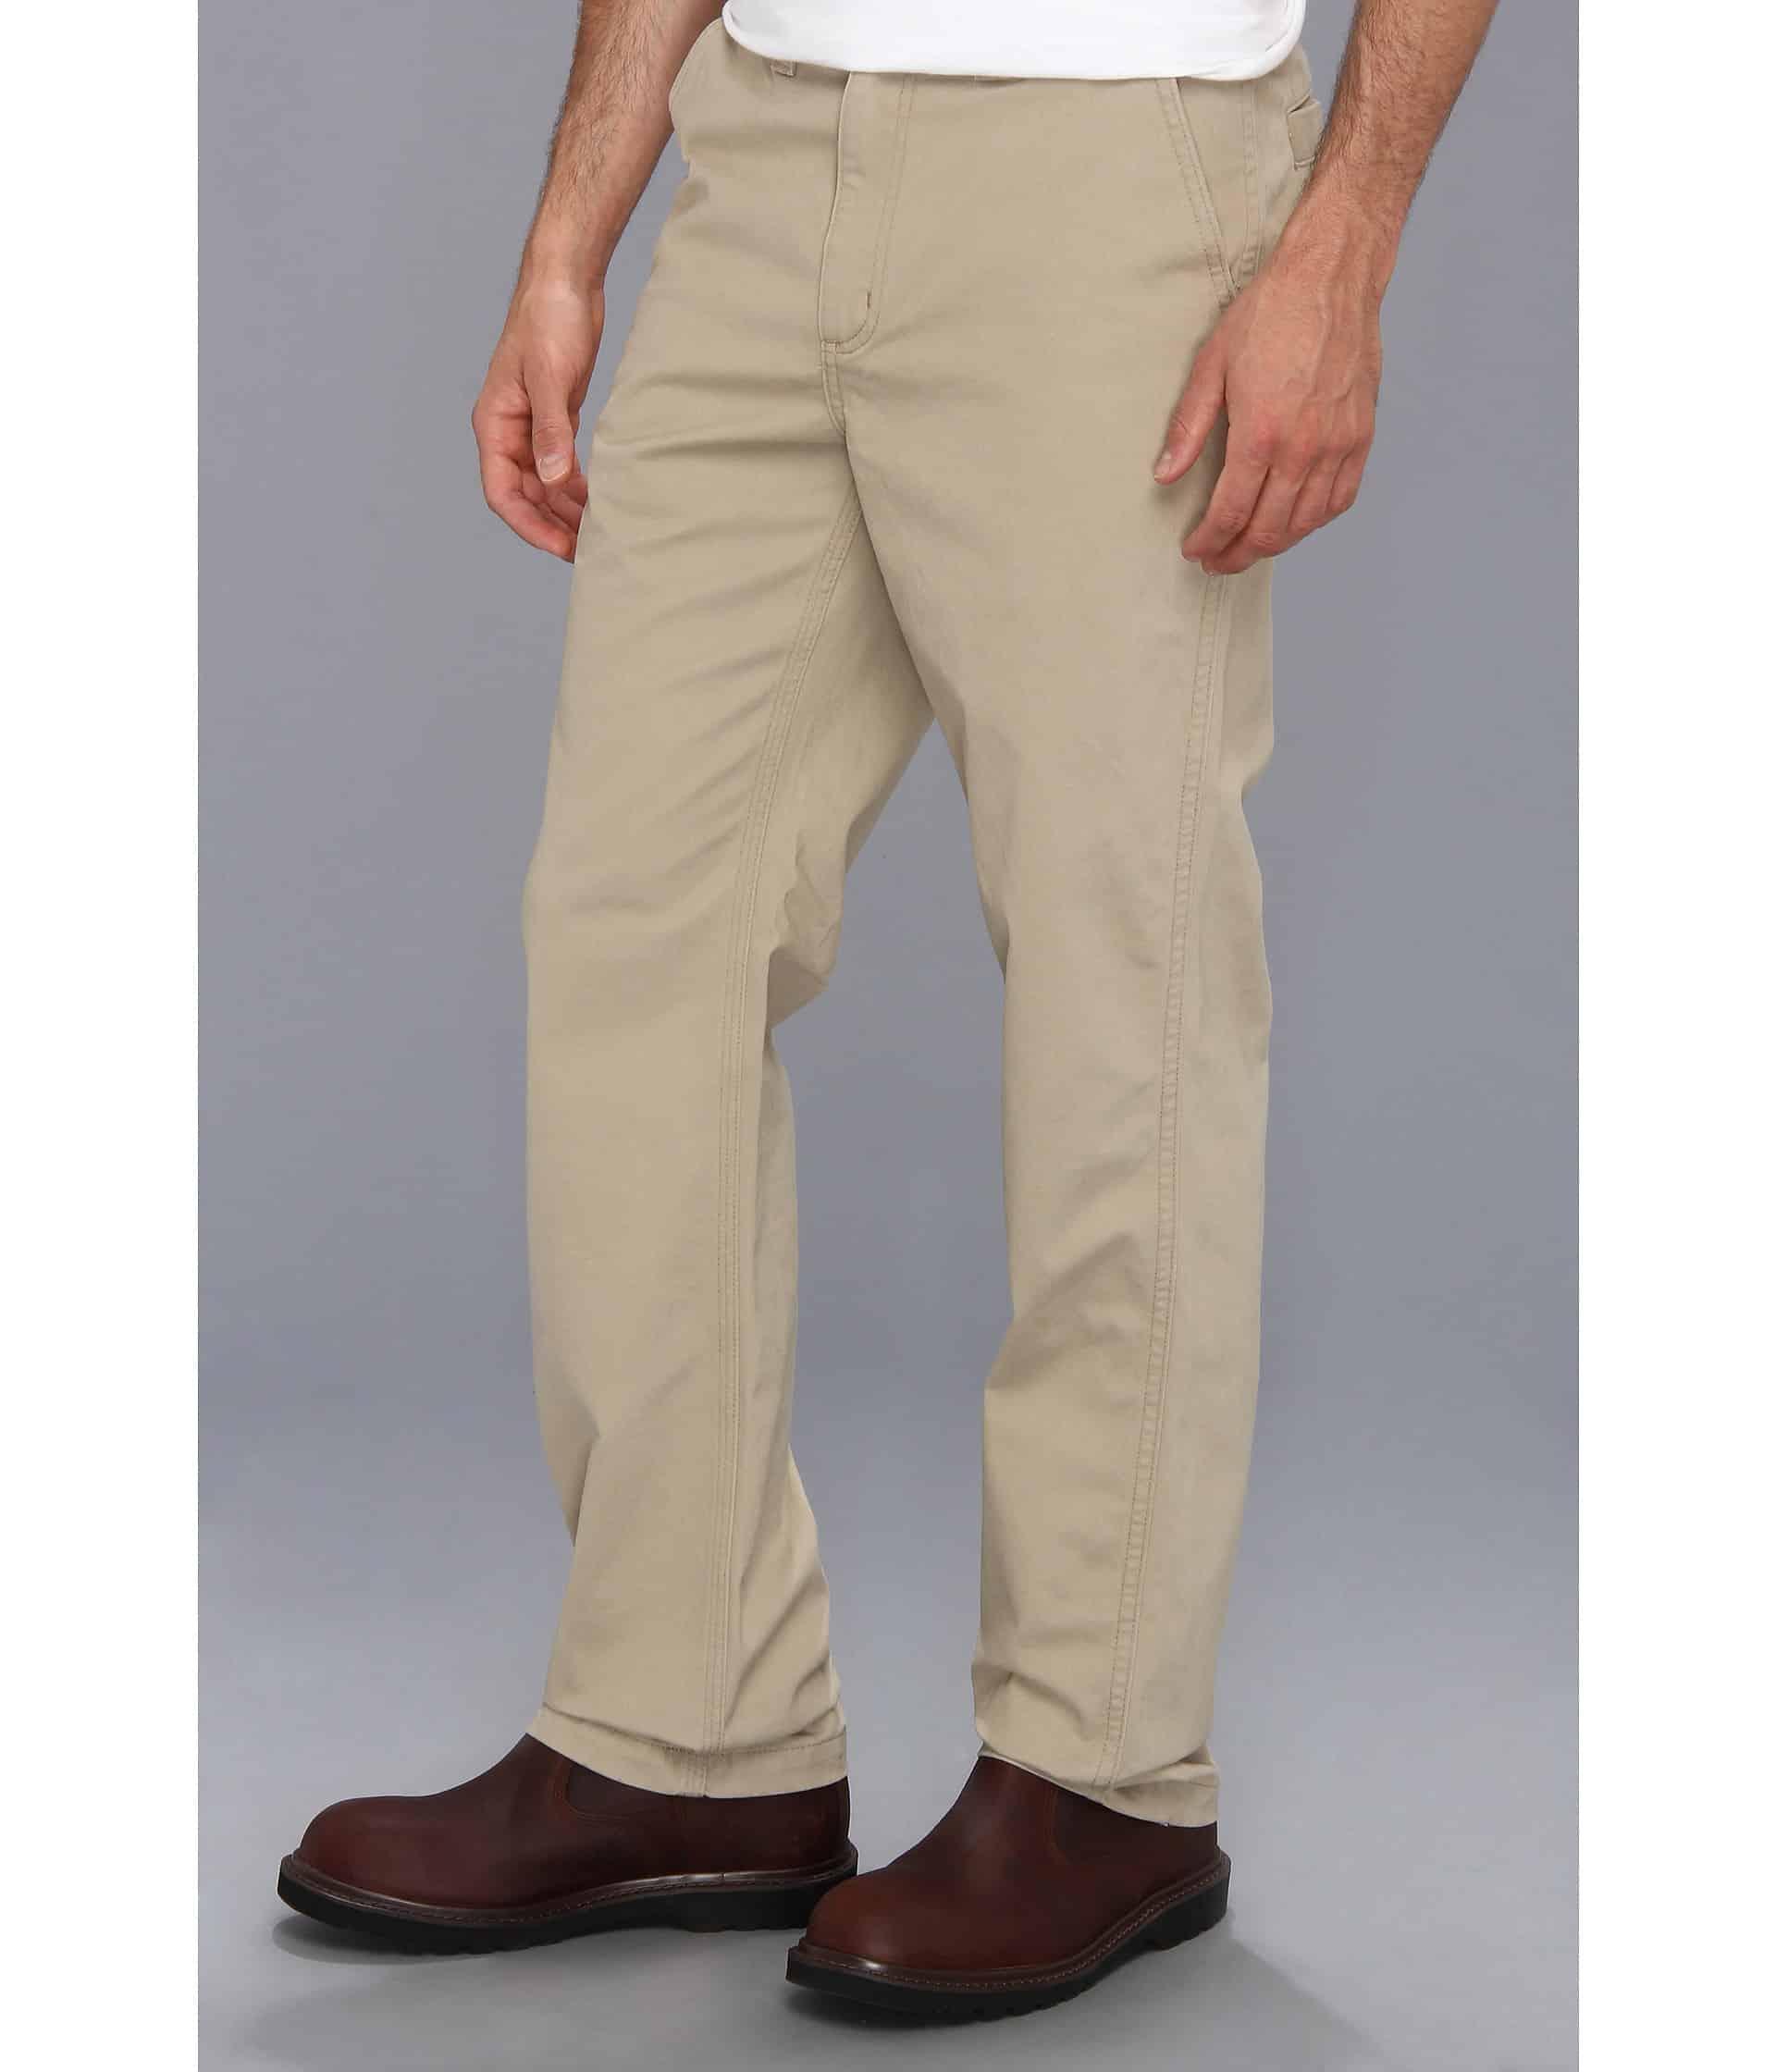 Carhartt Rugged Work Khakis Pants